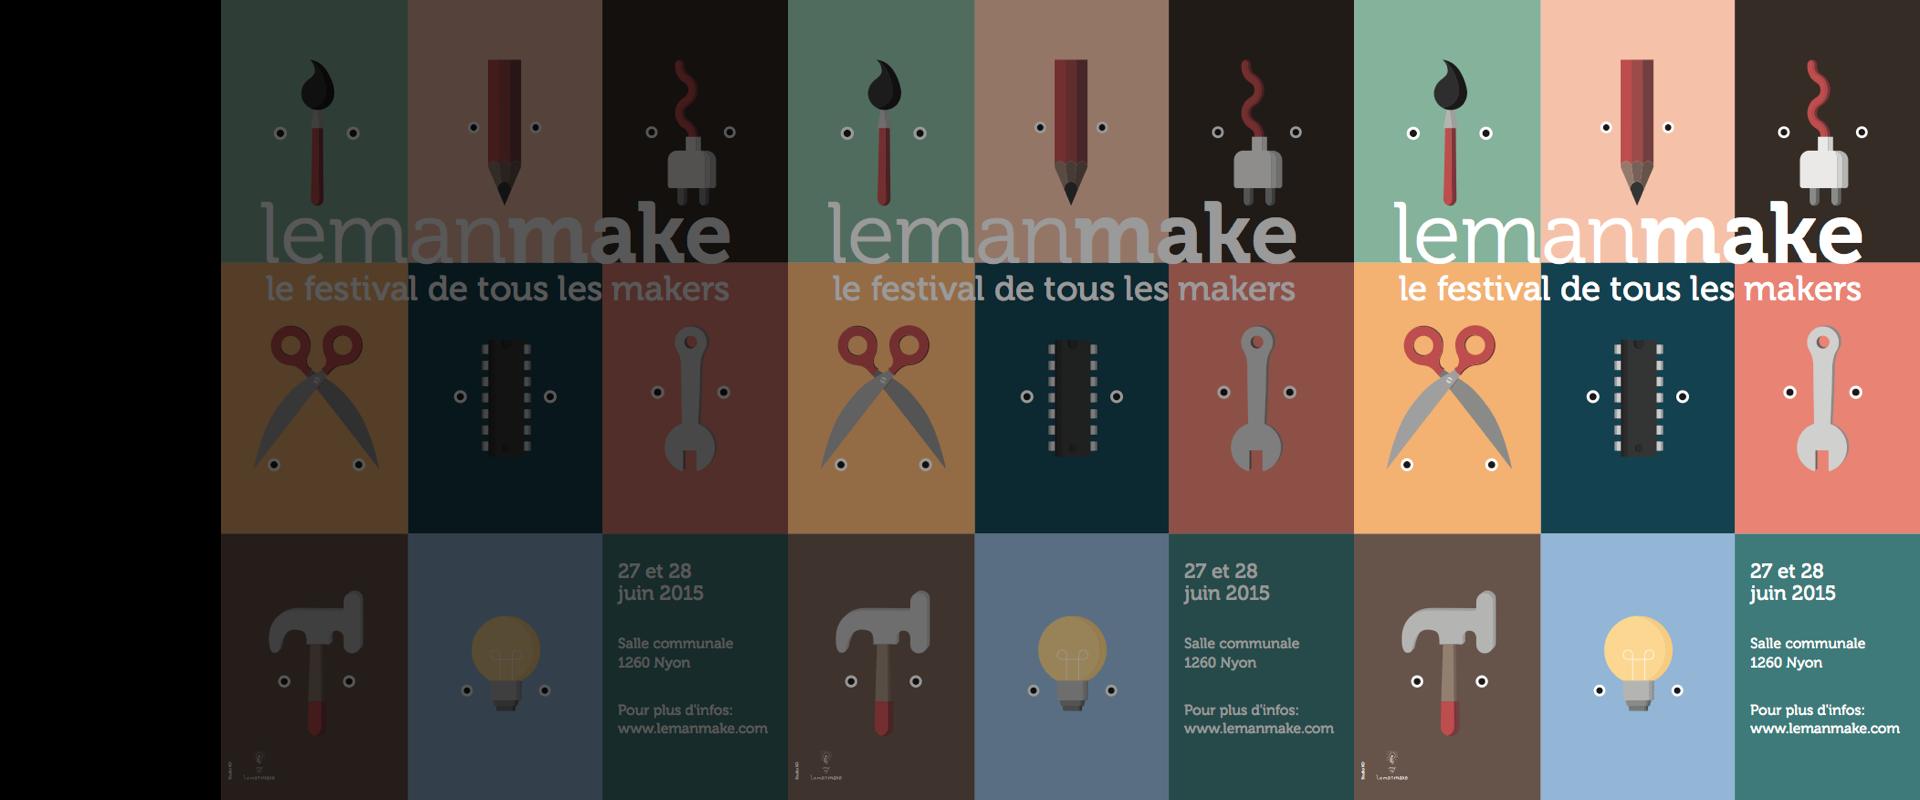 Leman Make